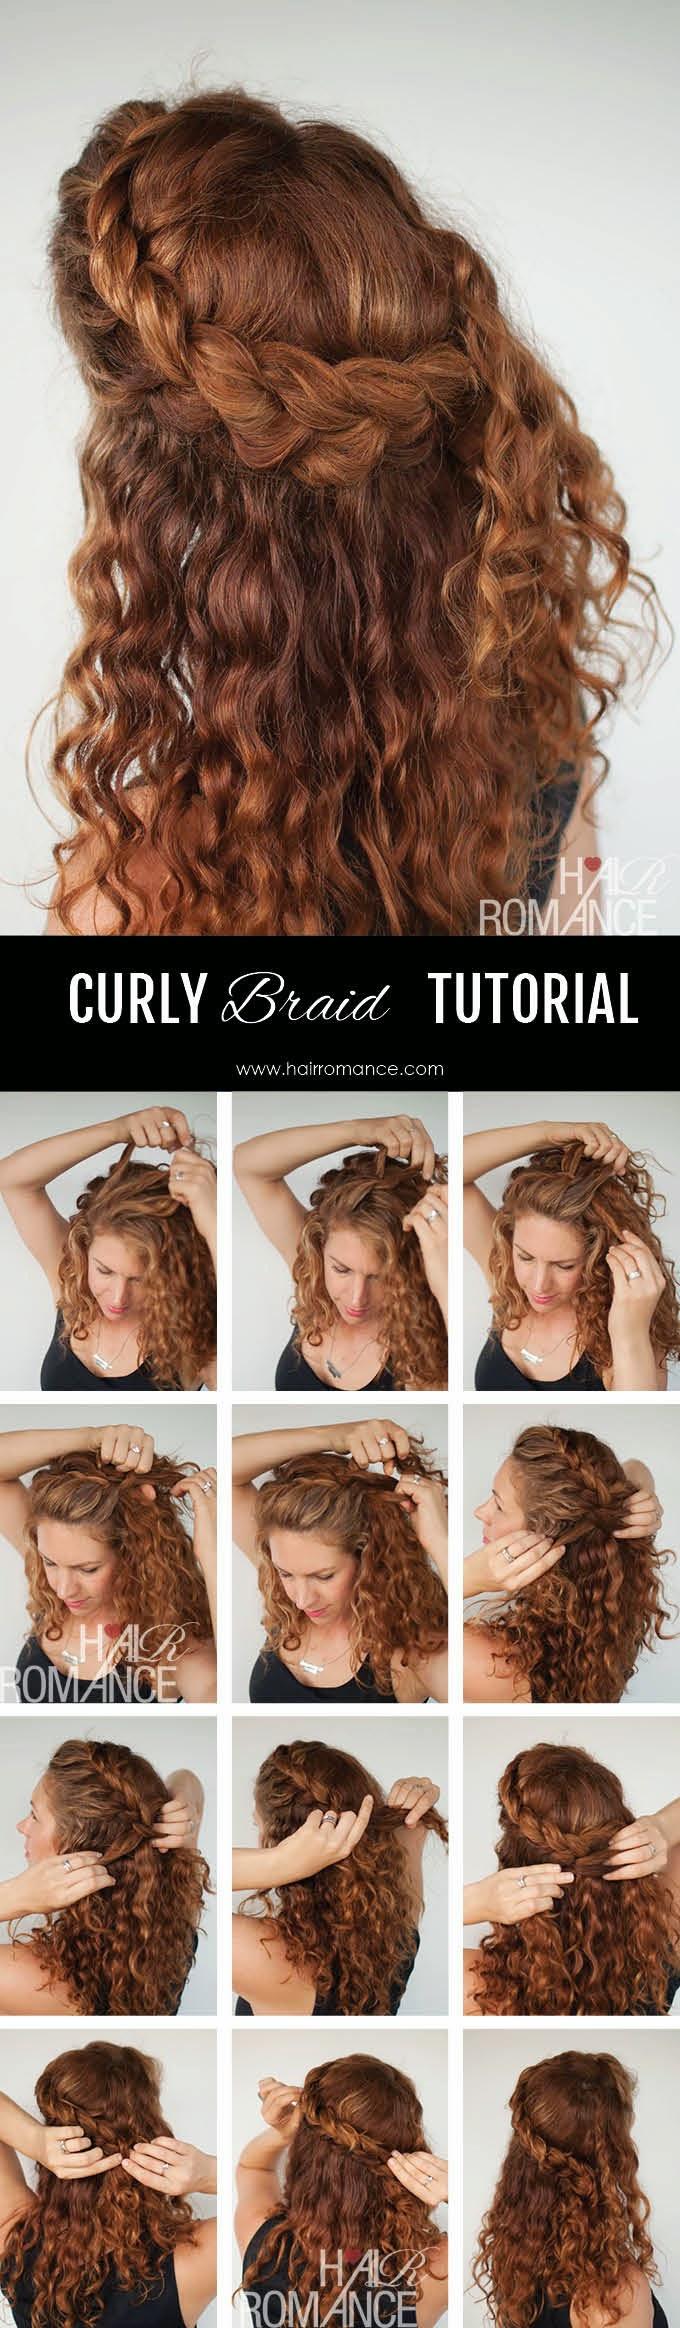 Astounding The Half Up Braid Hairstyle Tutorial Curly Hair Tutorial Short Hairstyles Gunalazisus